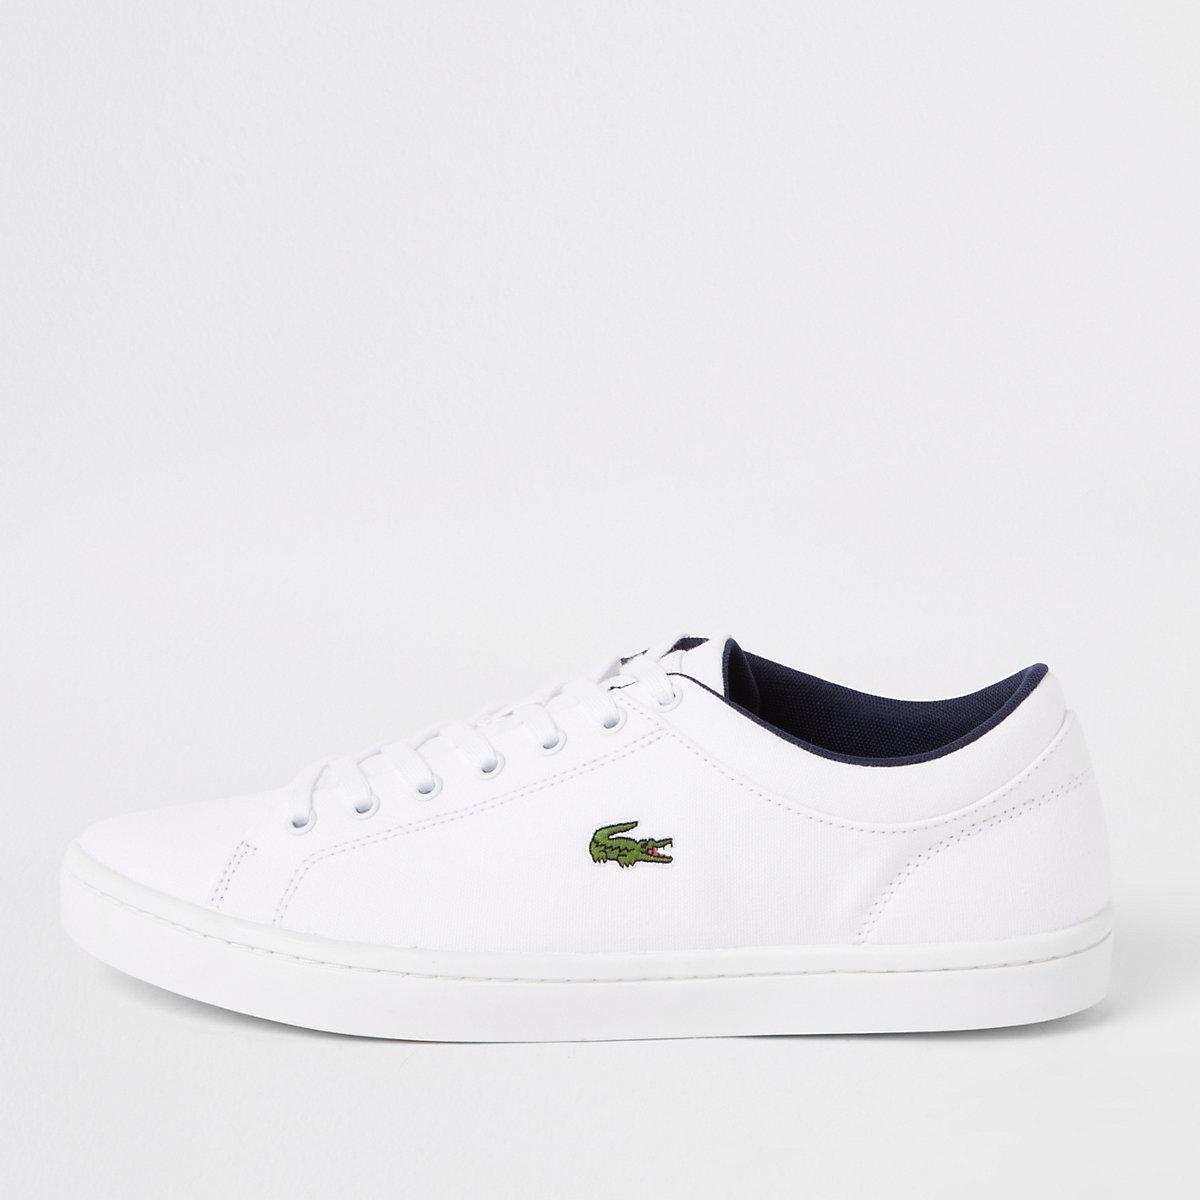 Laarzen amp; Sneakers Straightset Schoenen Lacoste Witte wxSqvwX1